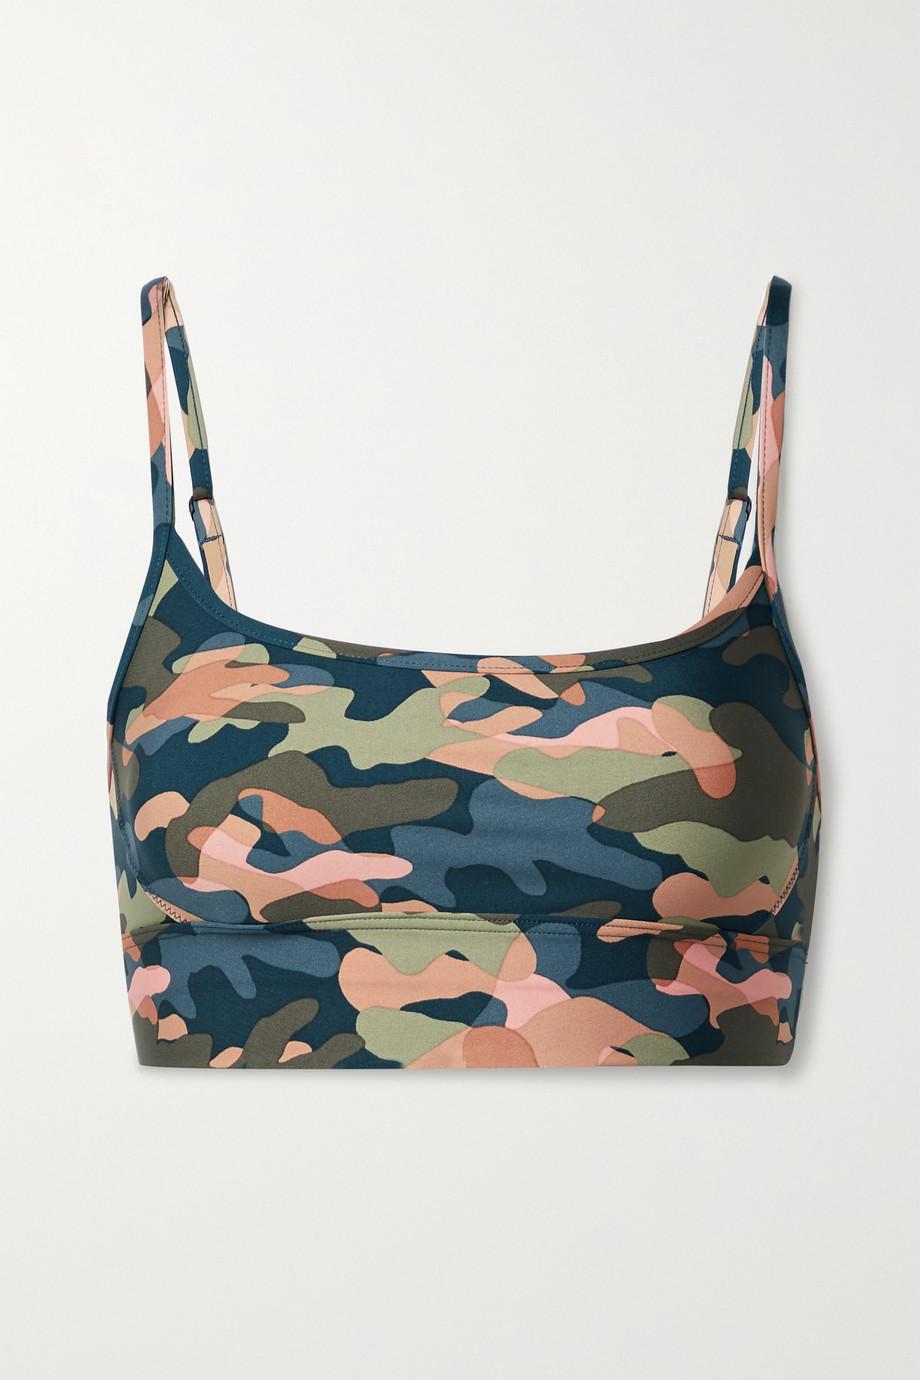 The Upside Himalaya camouflage-print stretch sports bra